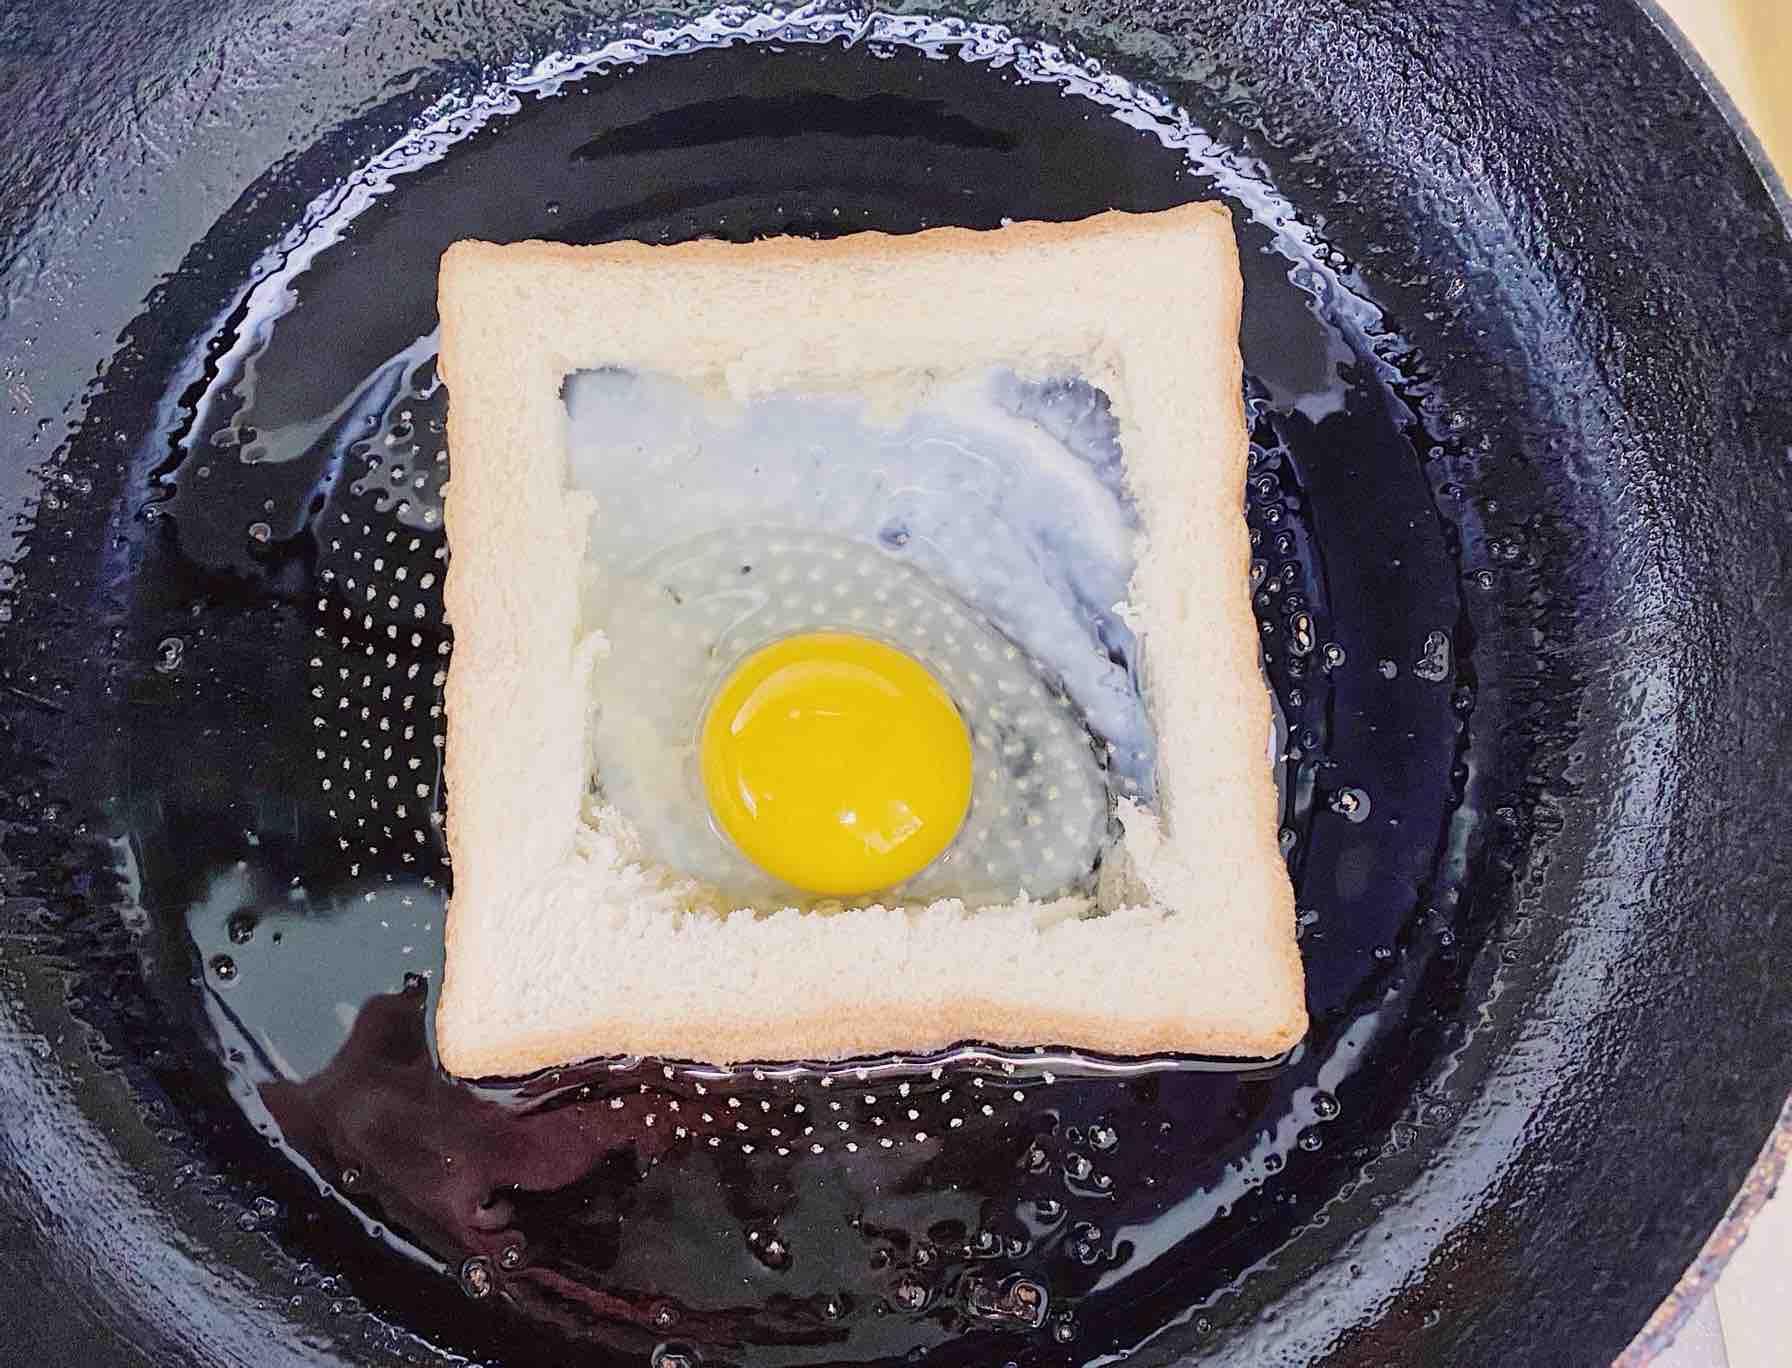 ㊙️食材简单 5分钟脆香芝士吐司的简单做法